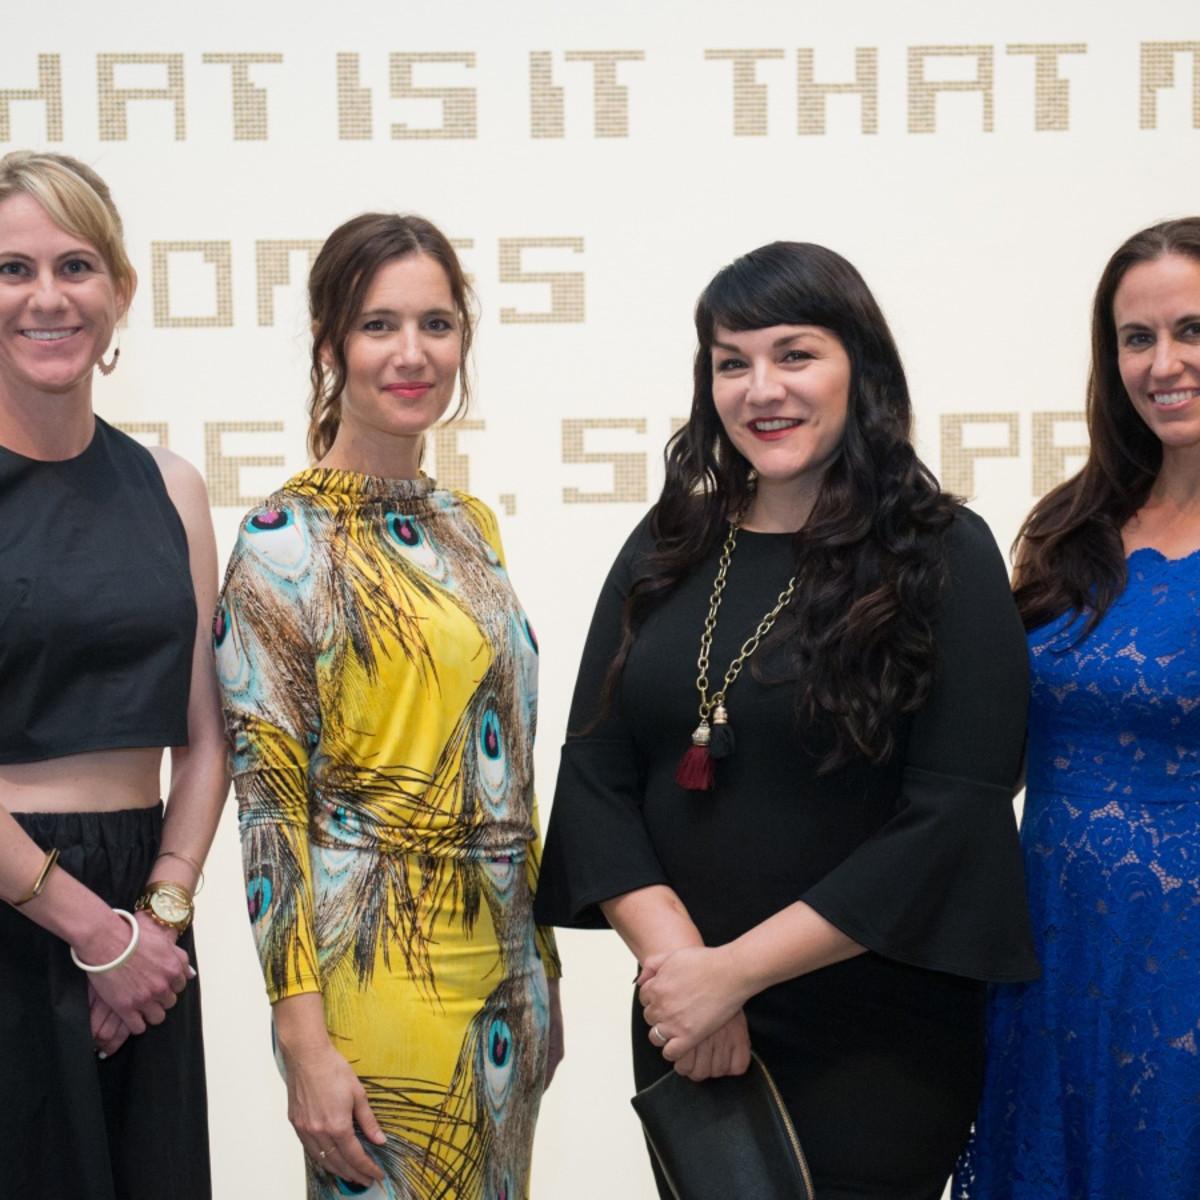 Houston, MFAH HOME Opening Dinner, November 2017, Margot Williams, Megan Scarborough, Pilar Tompkins Rivas, Susan Potter